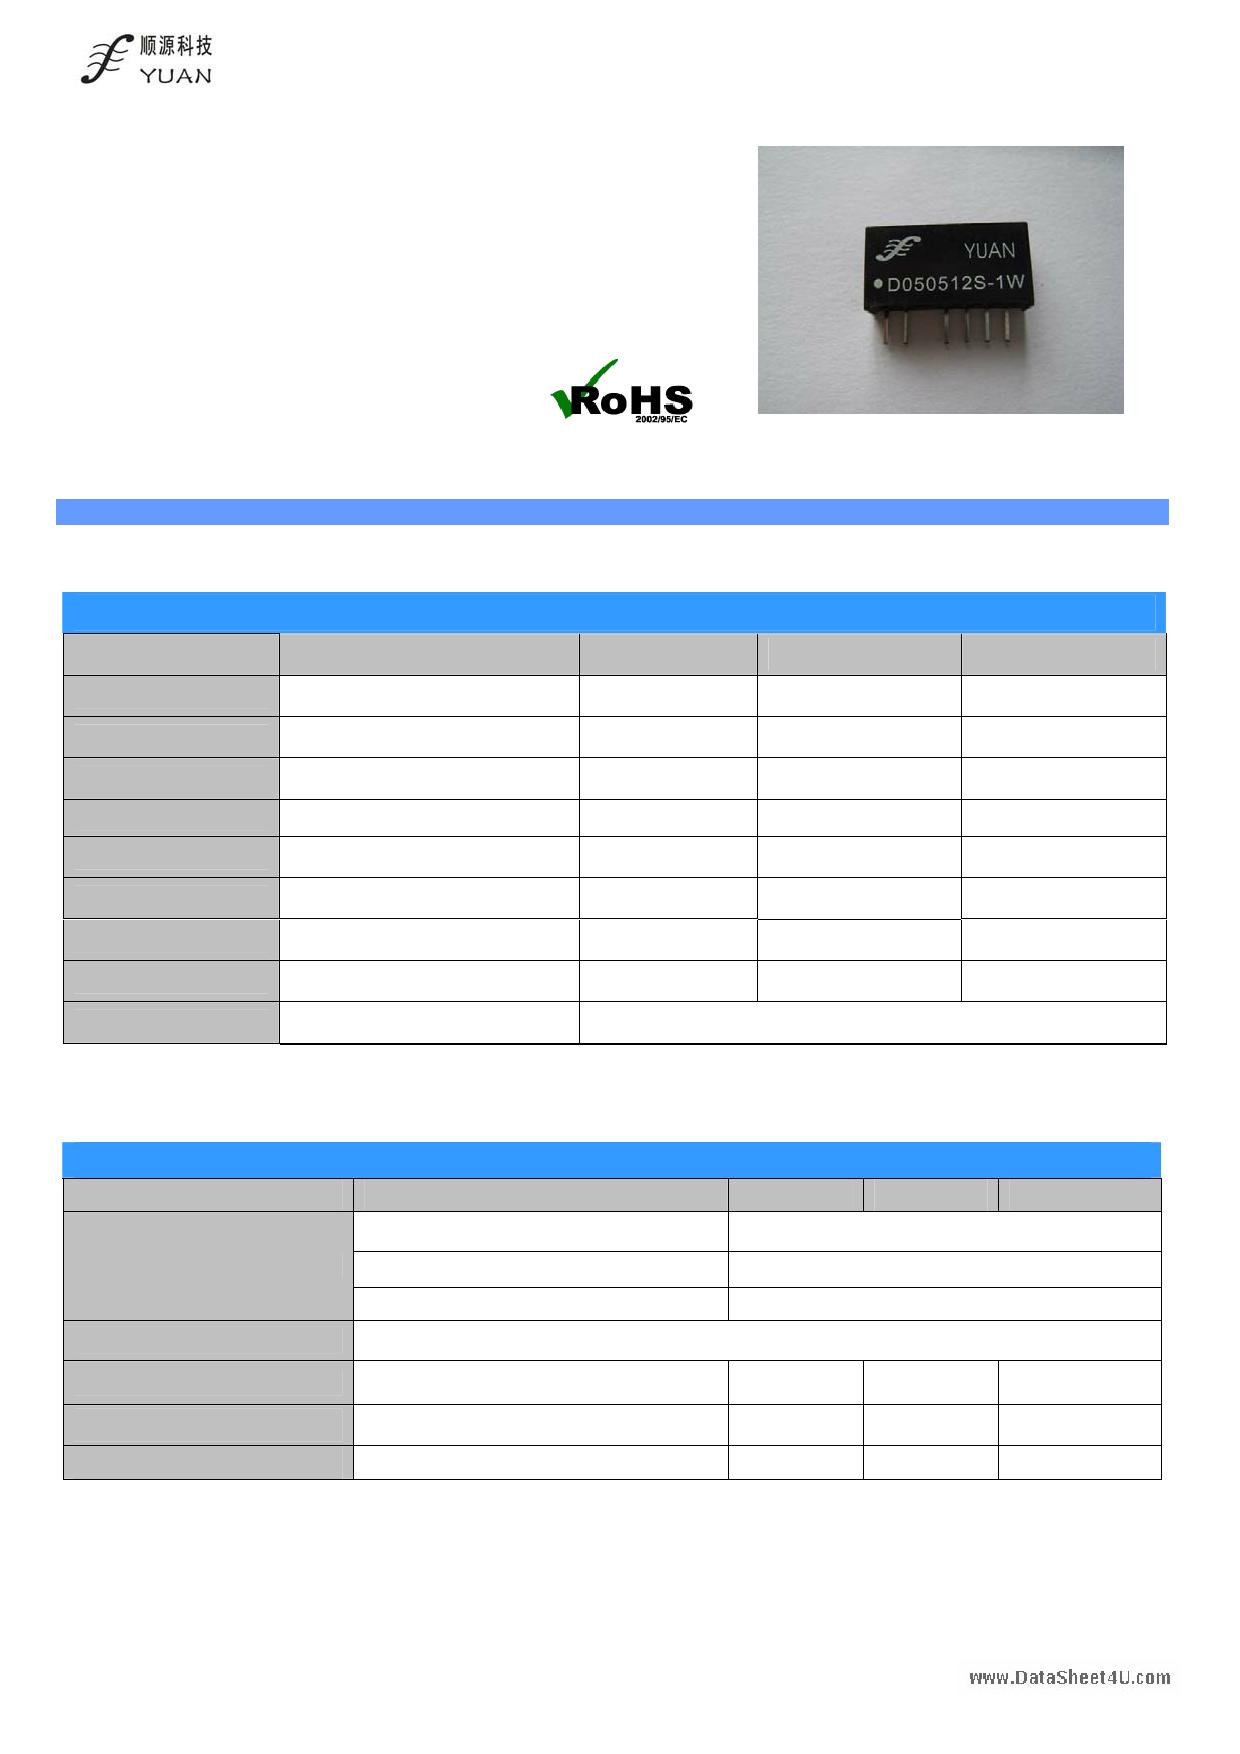 D05xxD-1W datasheet